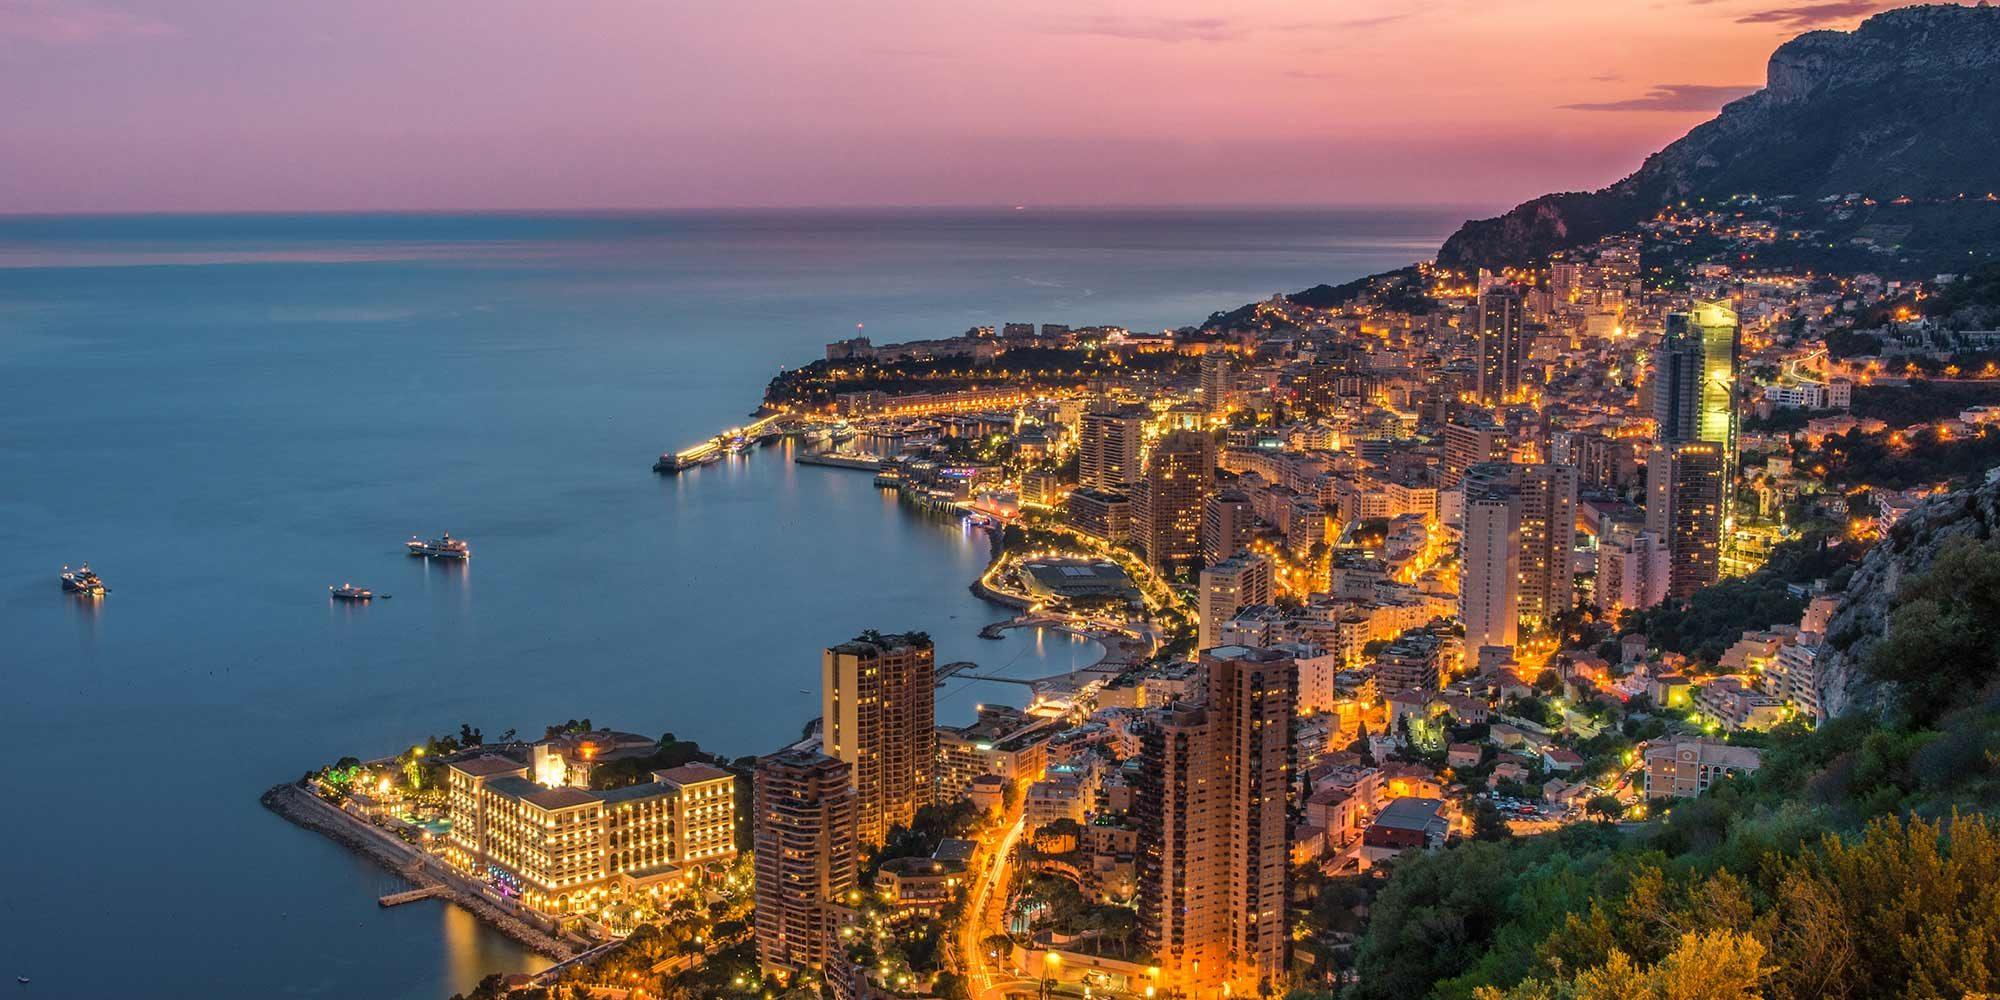 Monte Carlo Aerial photo